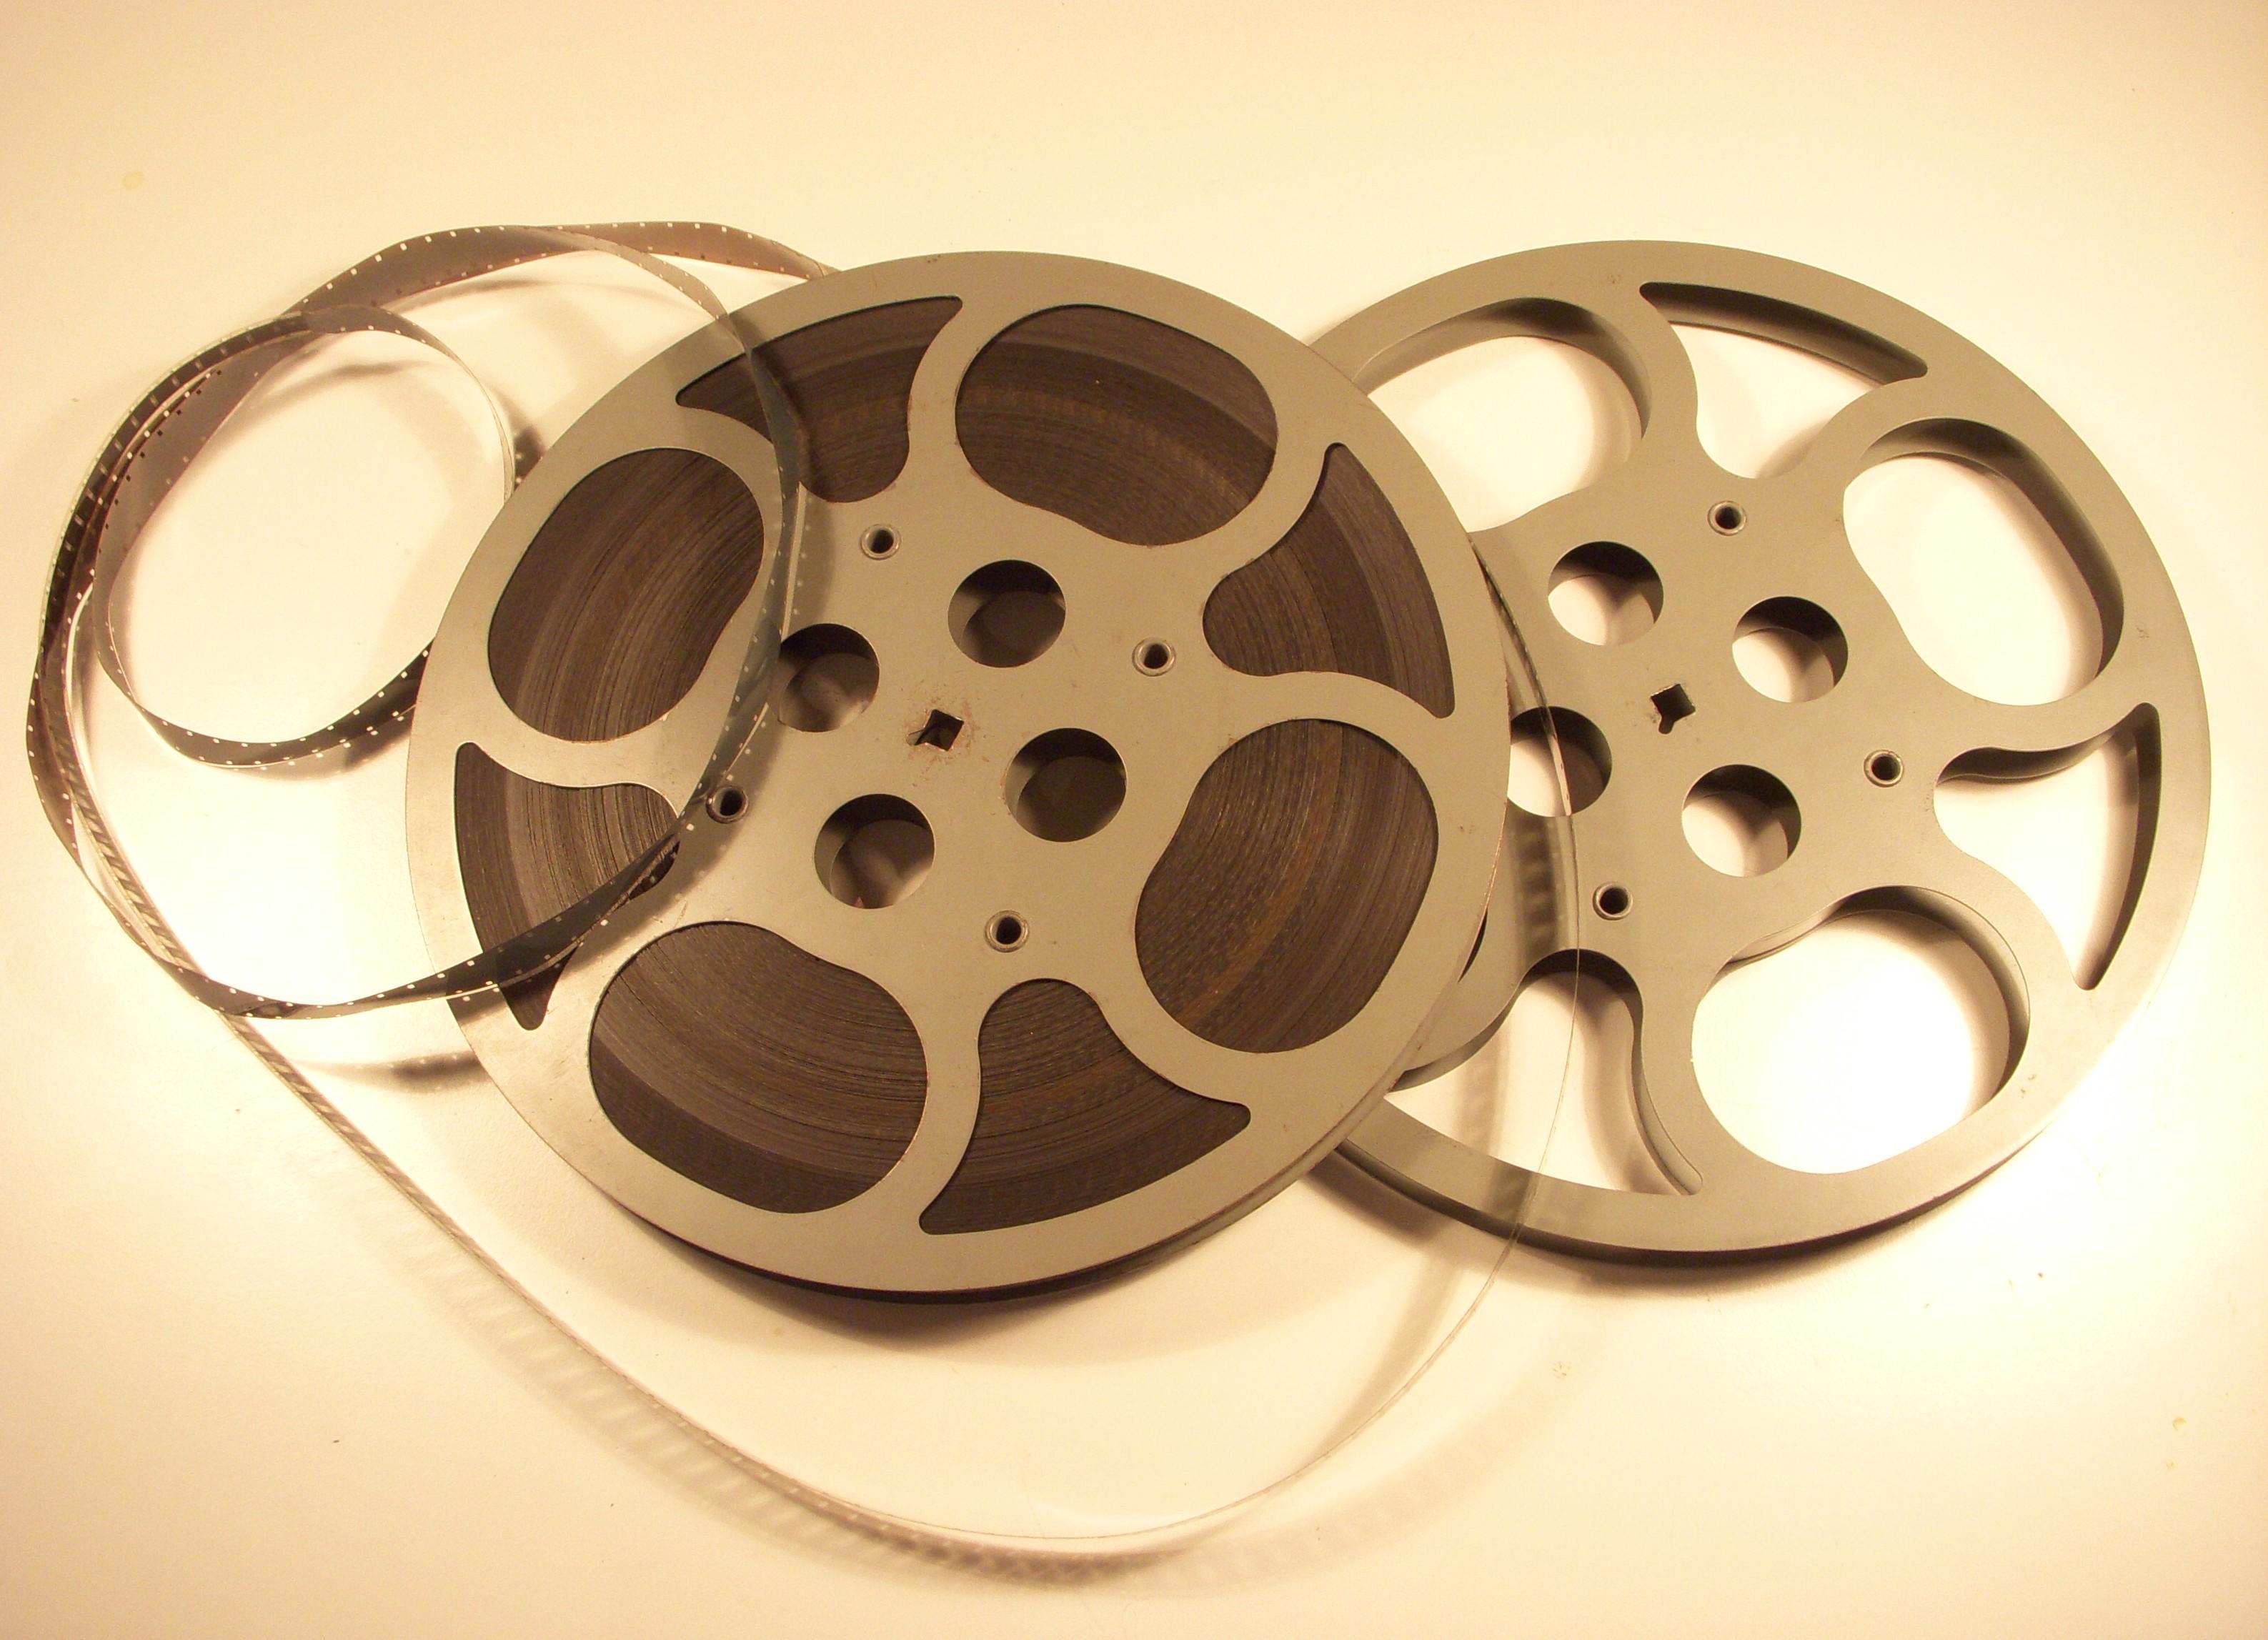 Dziga Vertov's Film Reels